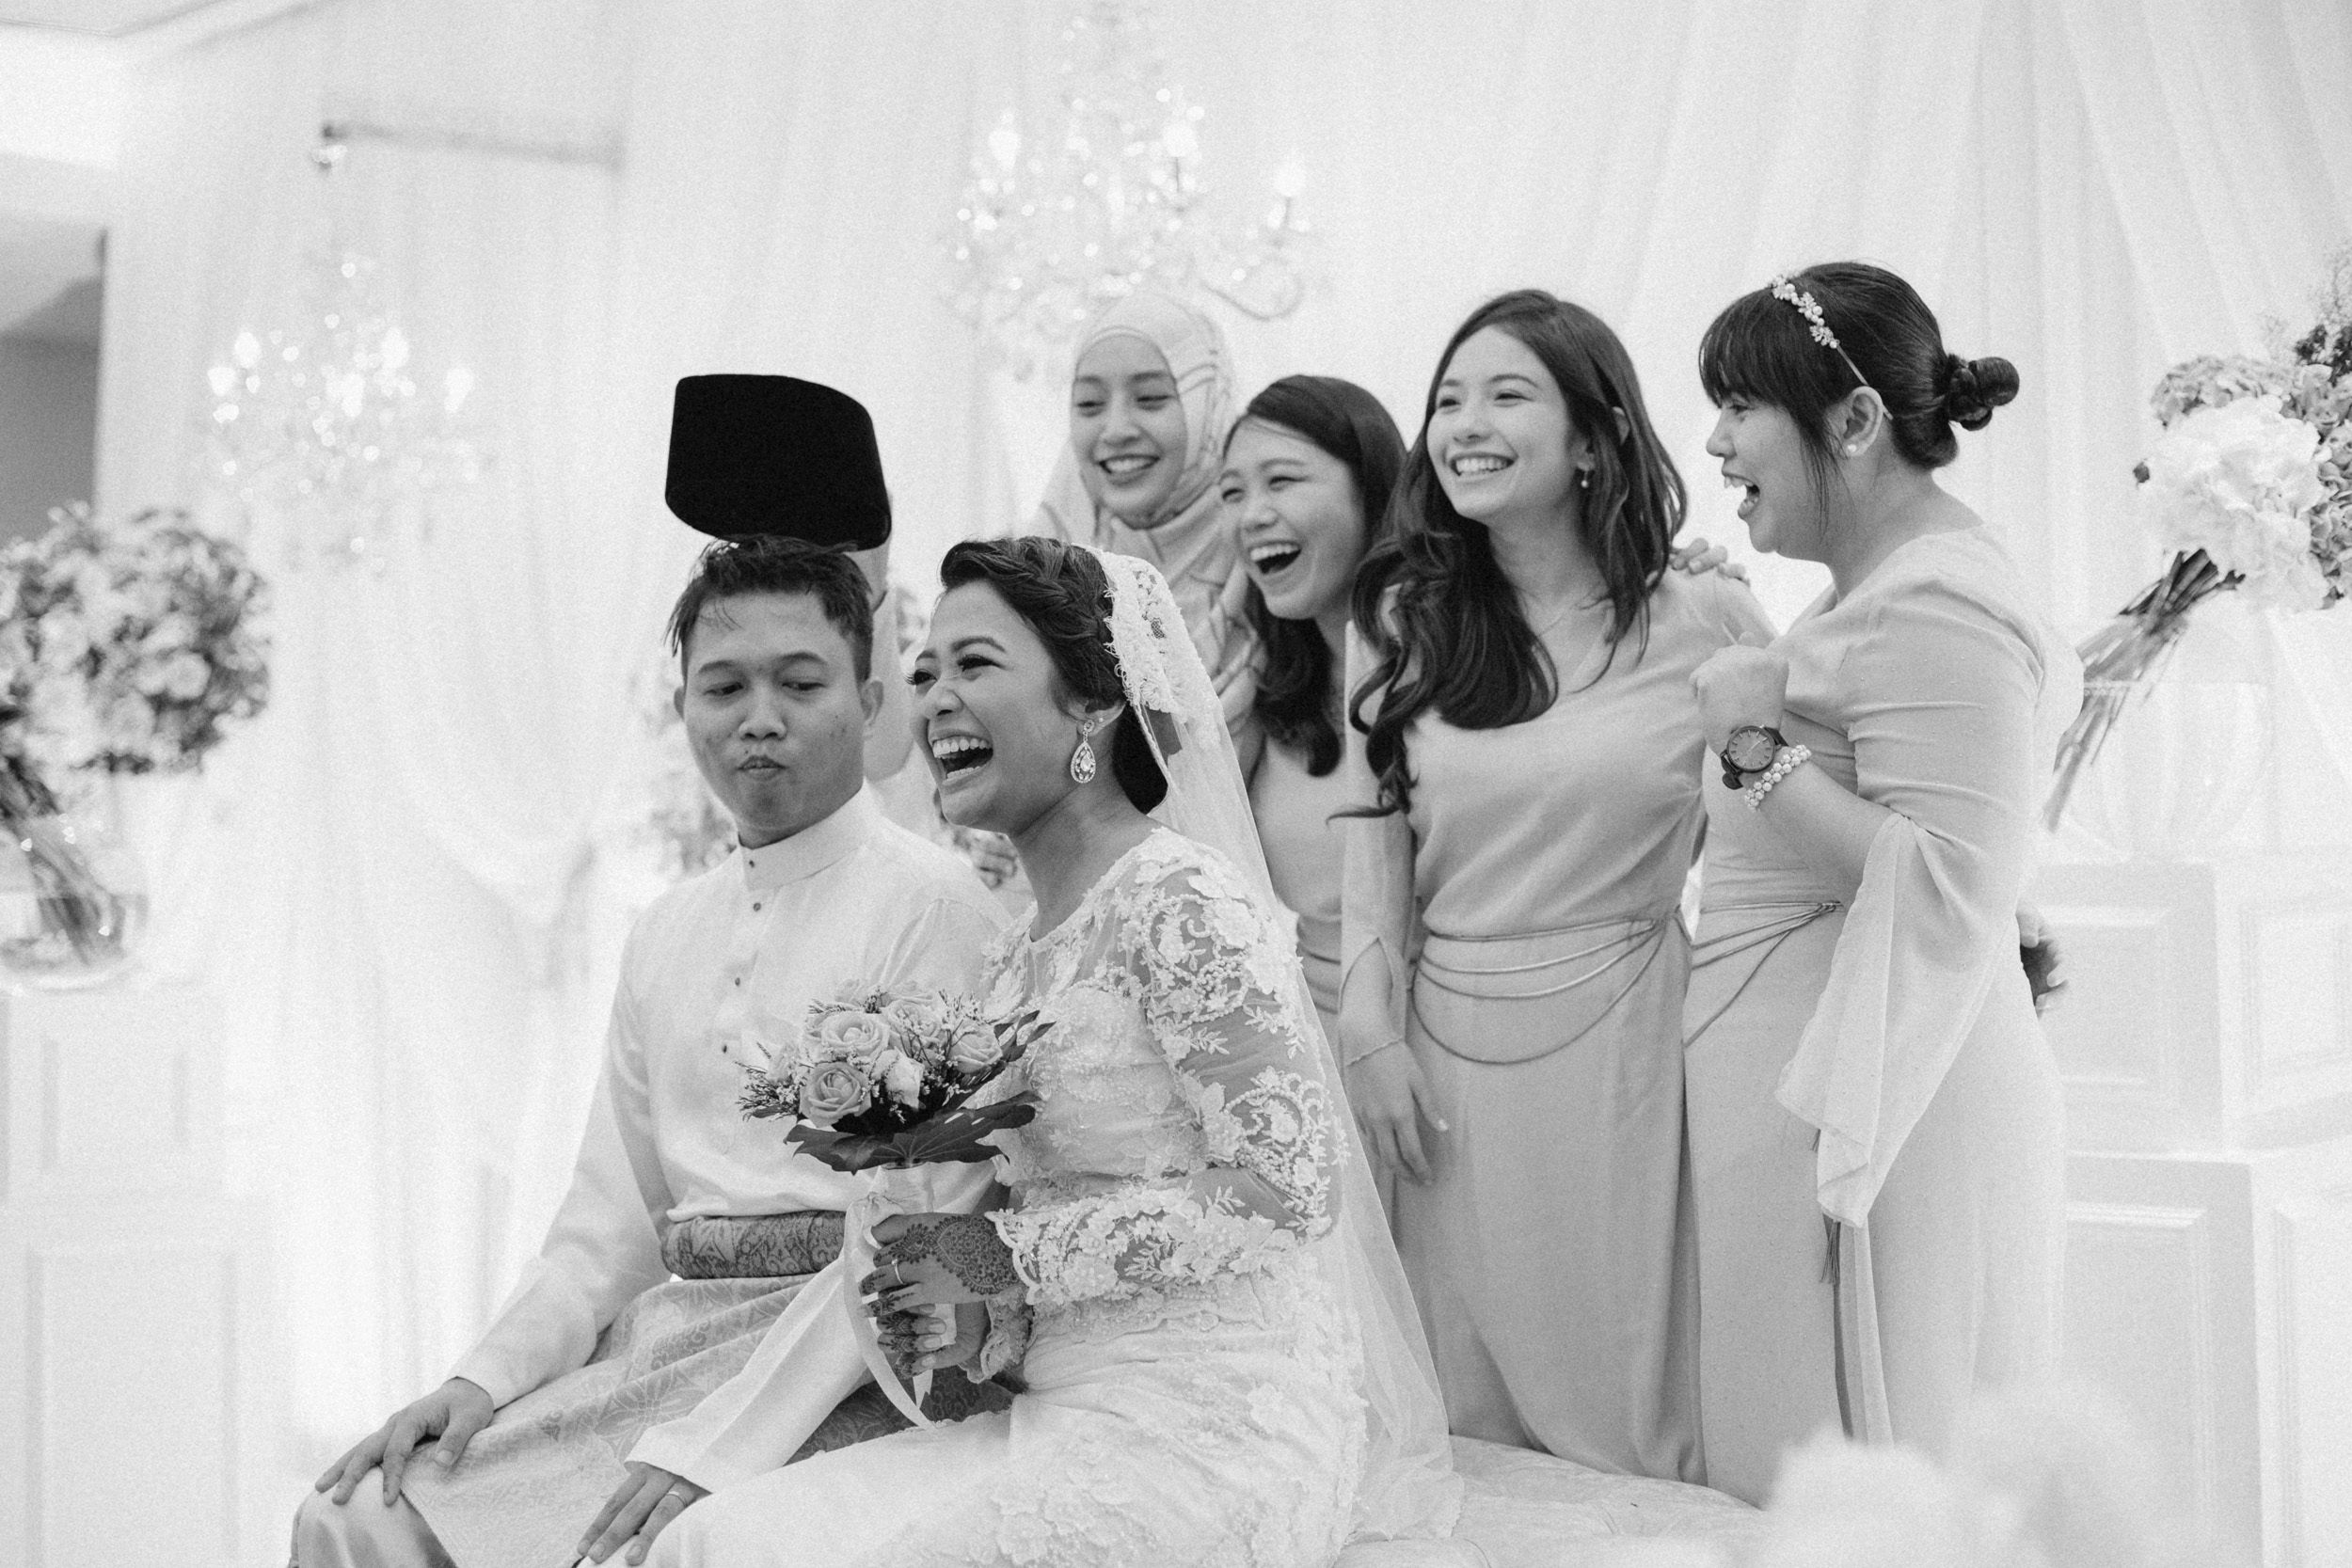 singapore-wedding-photographer-photography-wmt2017-070.jpg